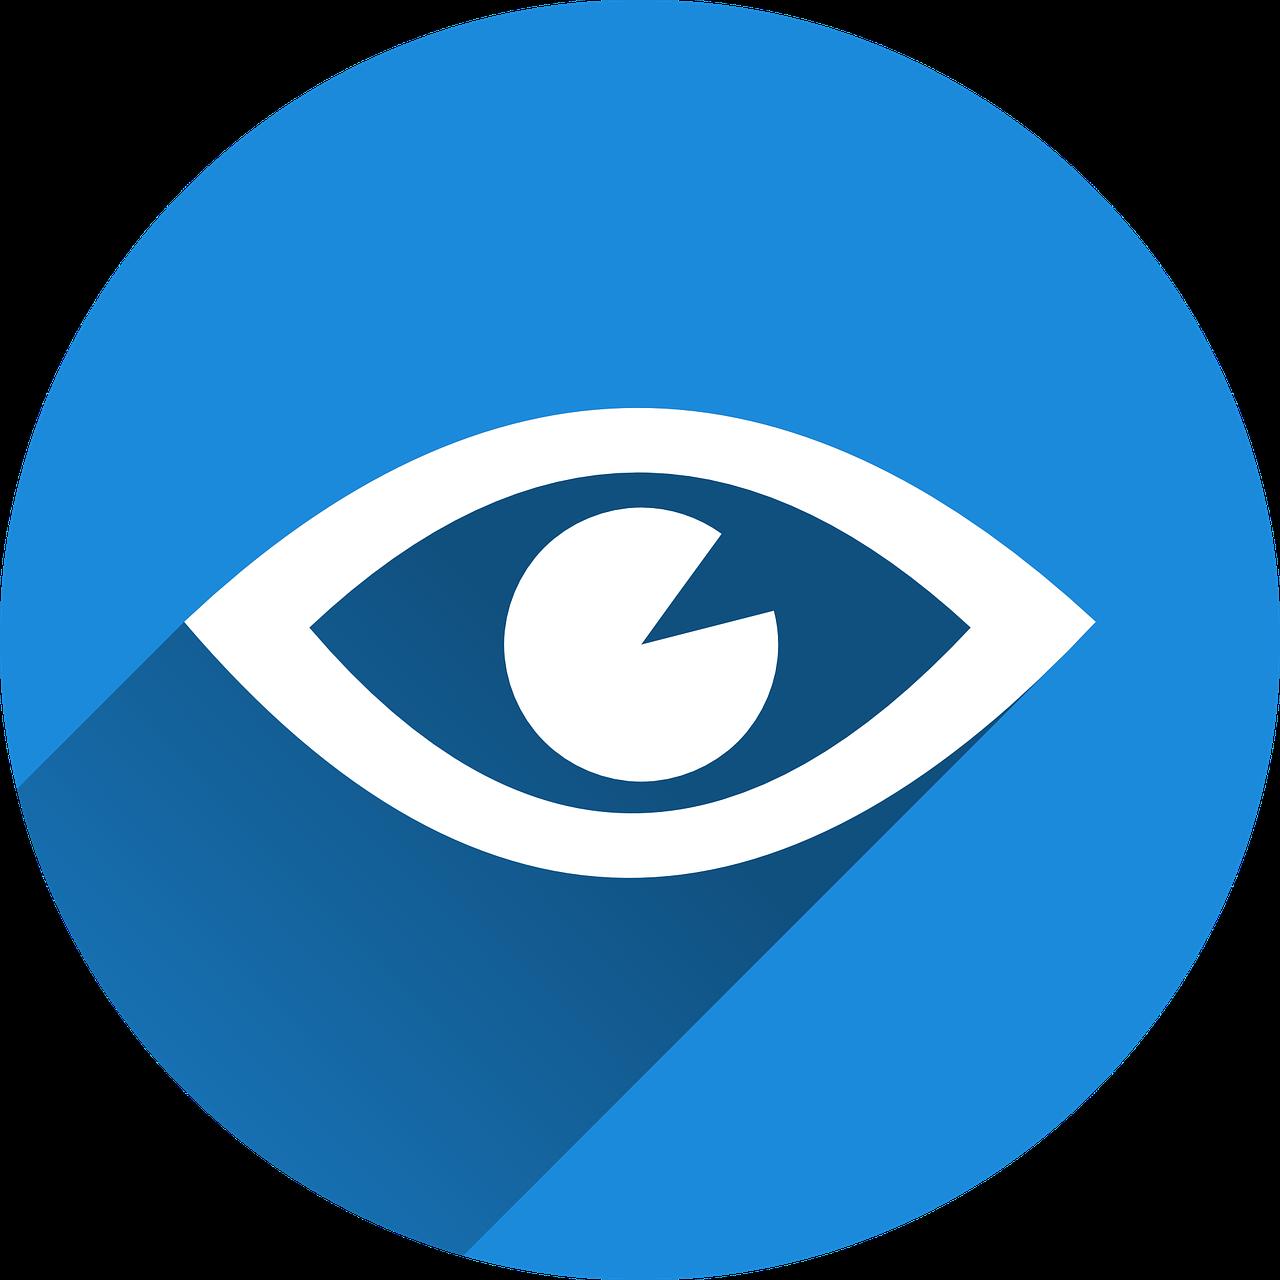 eye, see, viewing